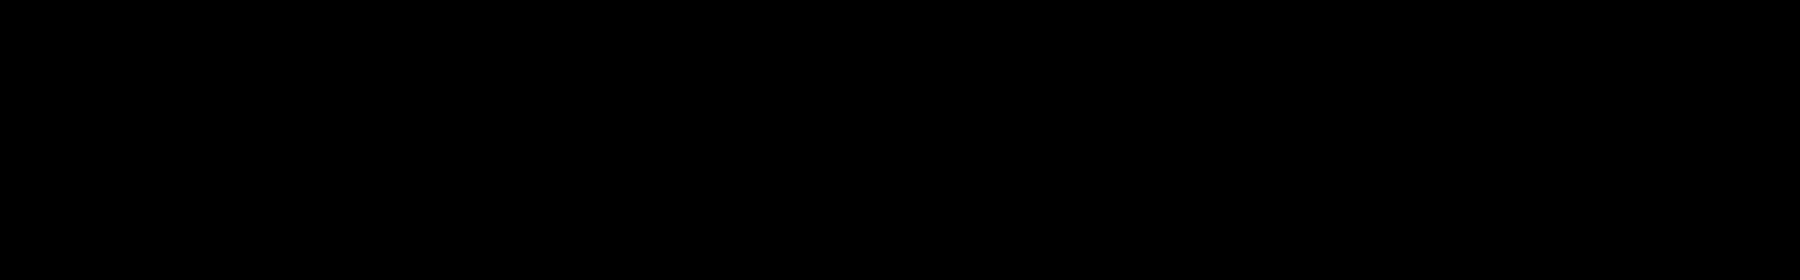 Cinemate audio waveform